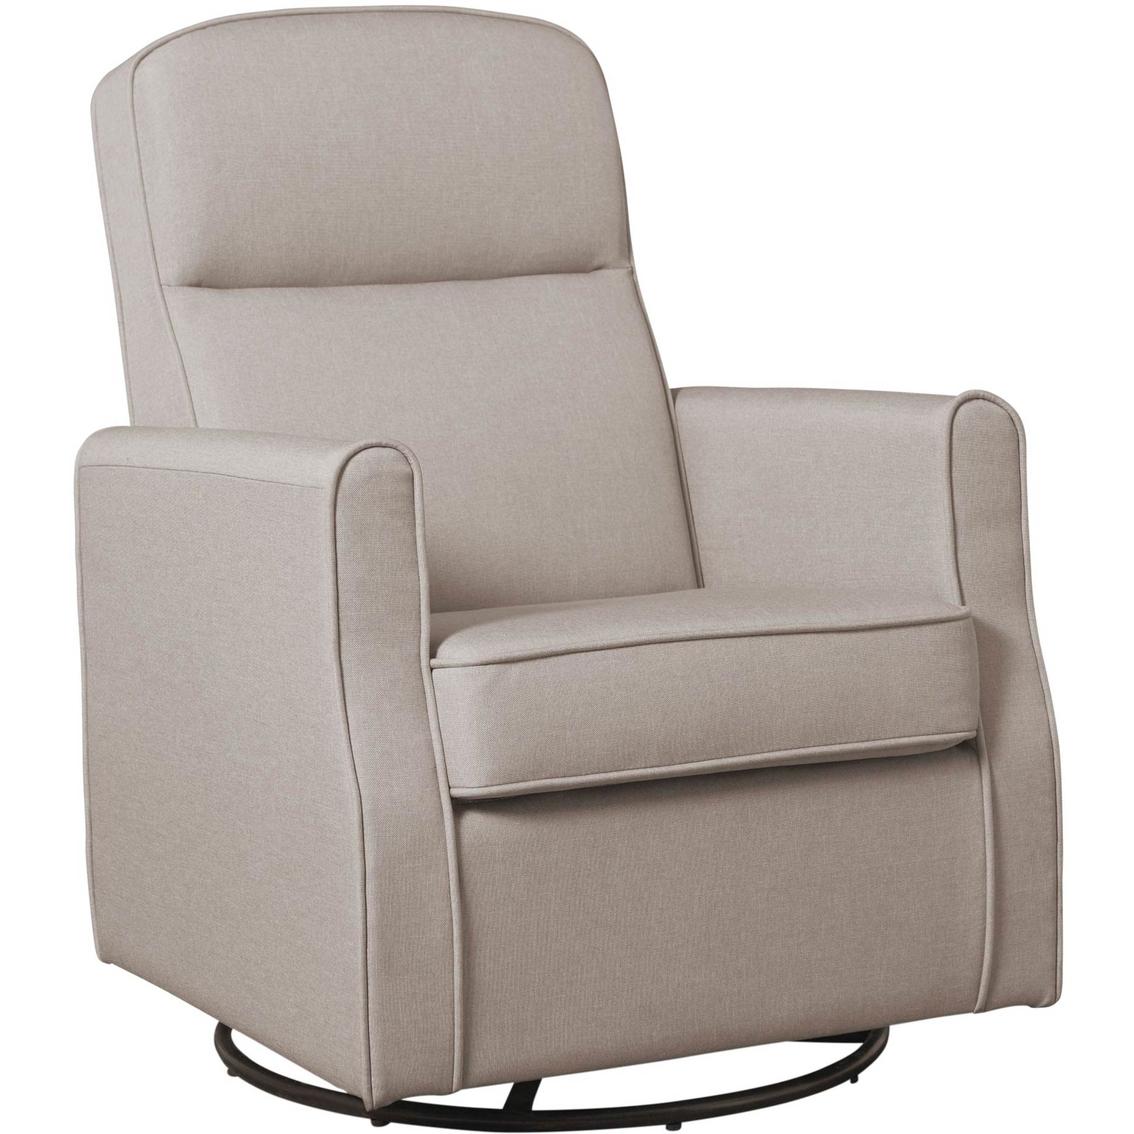 Marvelous Delta Children Blair Slim Nursery Glider Swivel Rocker Chair Beatyapartments Chair Design Images Beatyapartmentscom